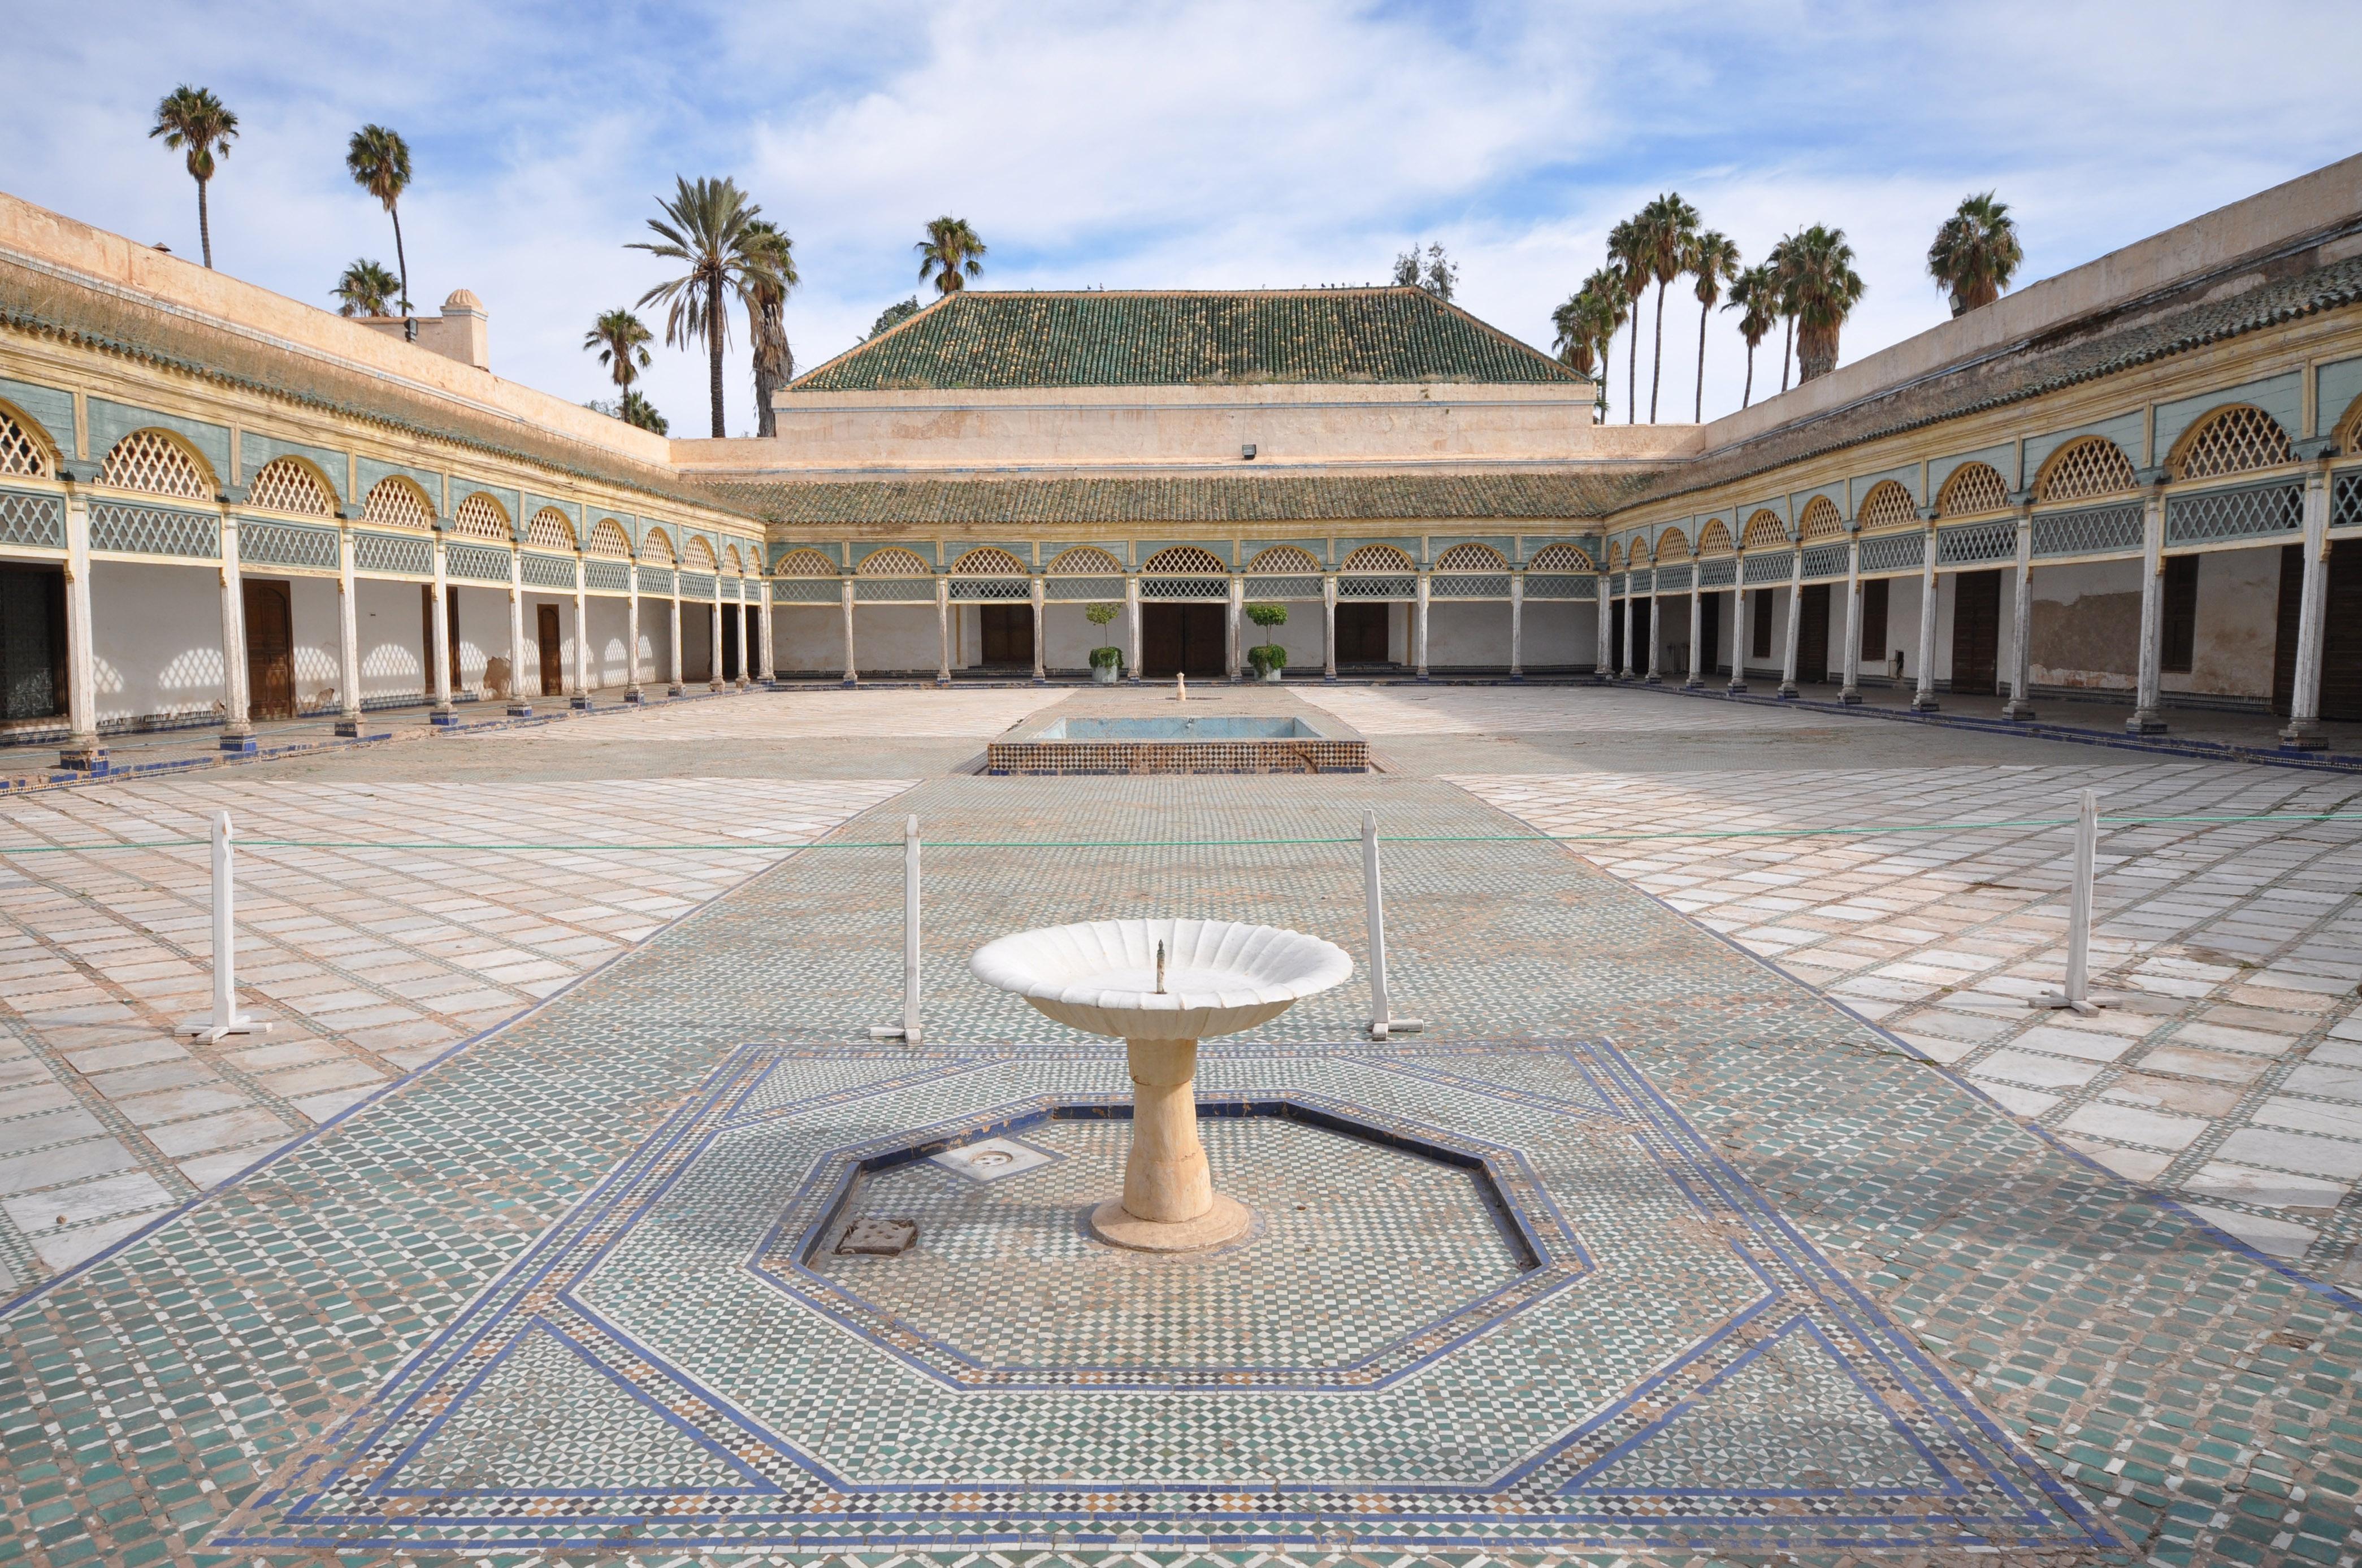 Palais Bahia (The Bahia Palace) (7346181900).jpg